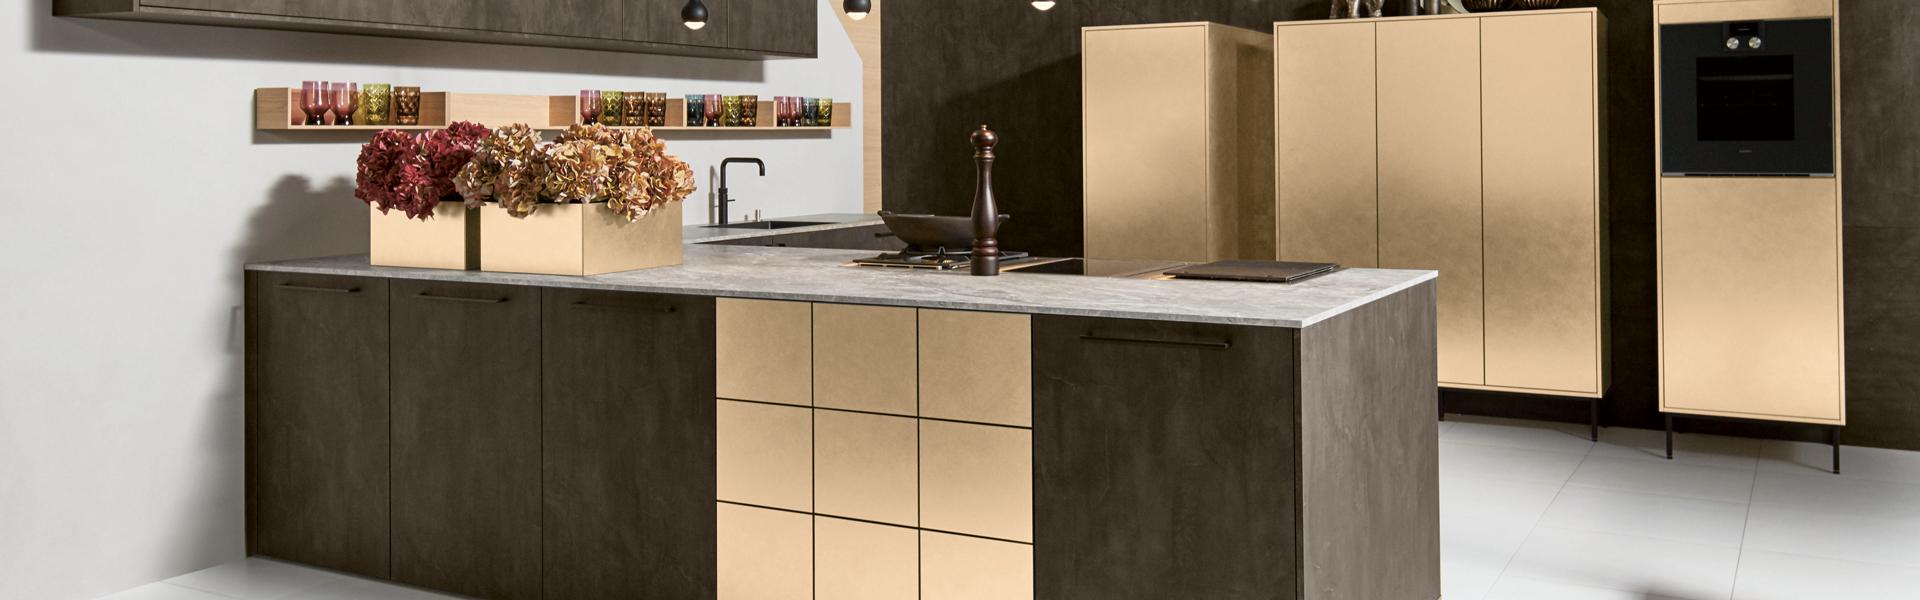 Trendy u-keuken met goud | Eigenhuis Keukens